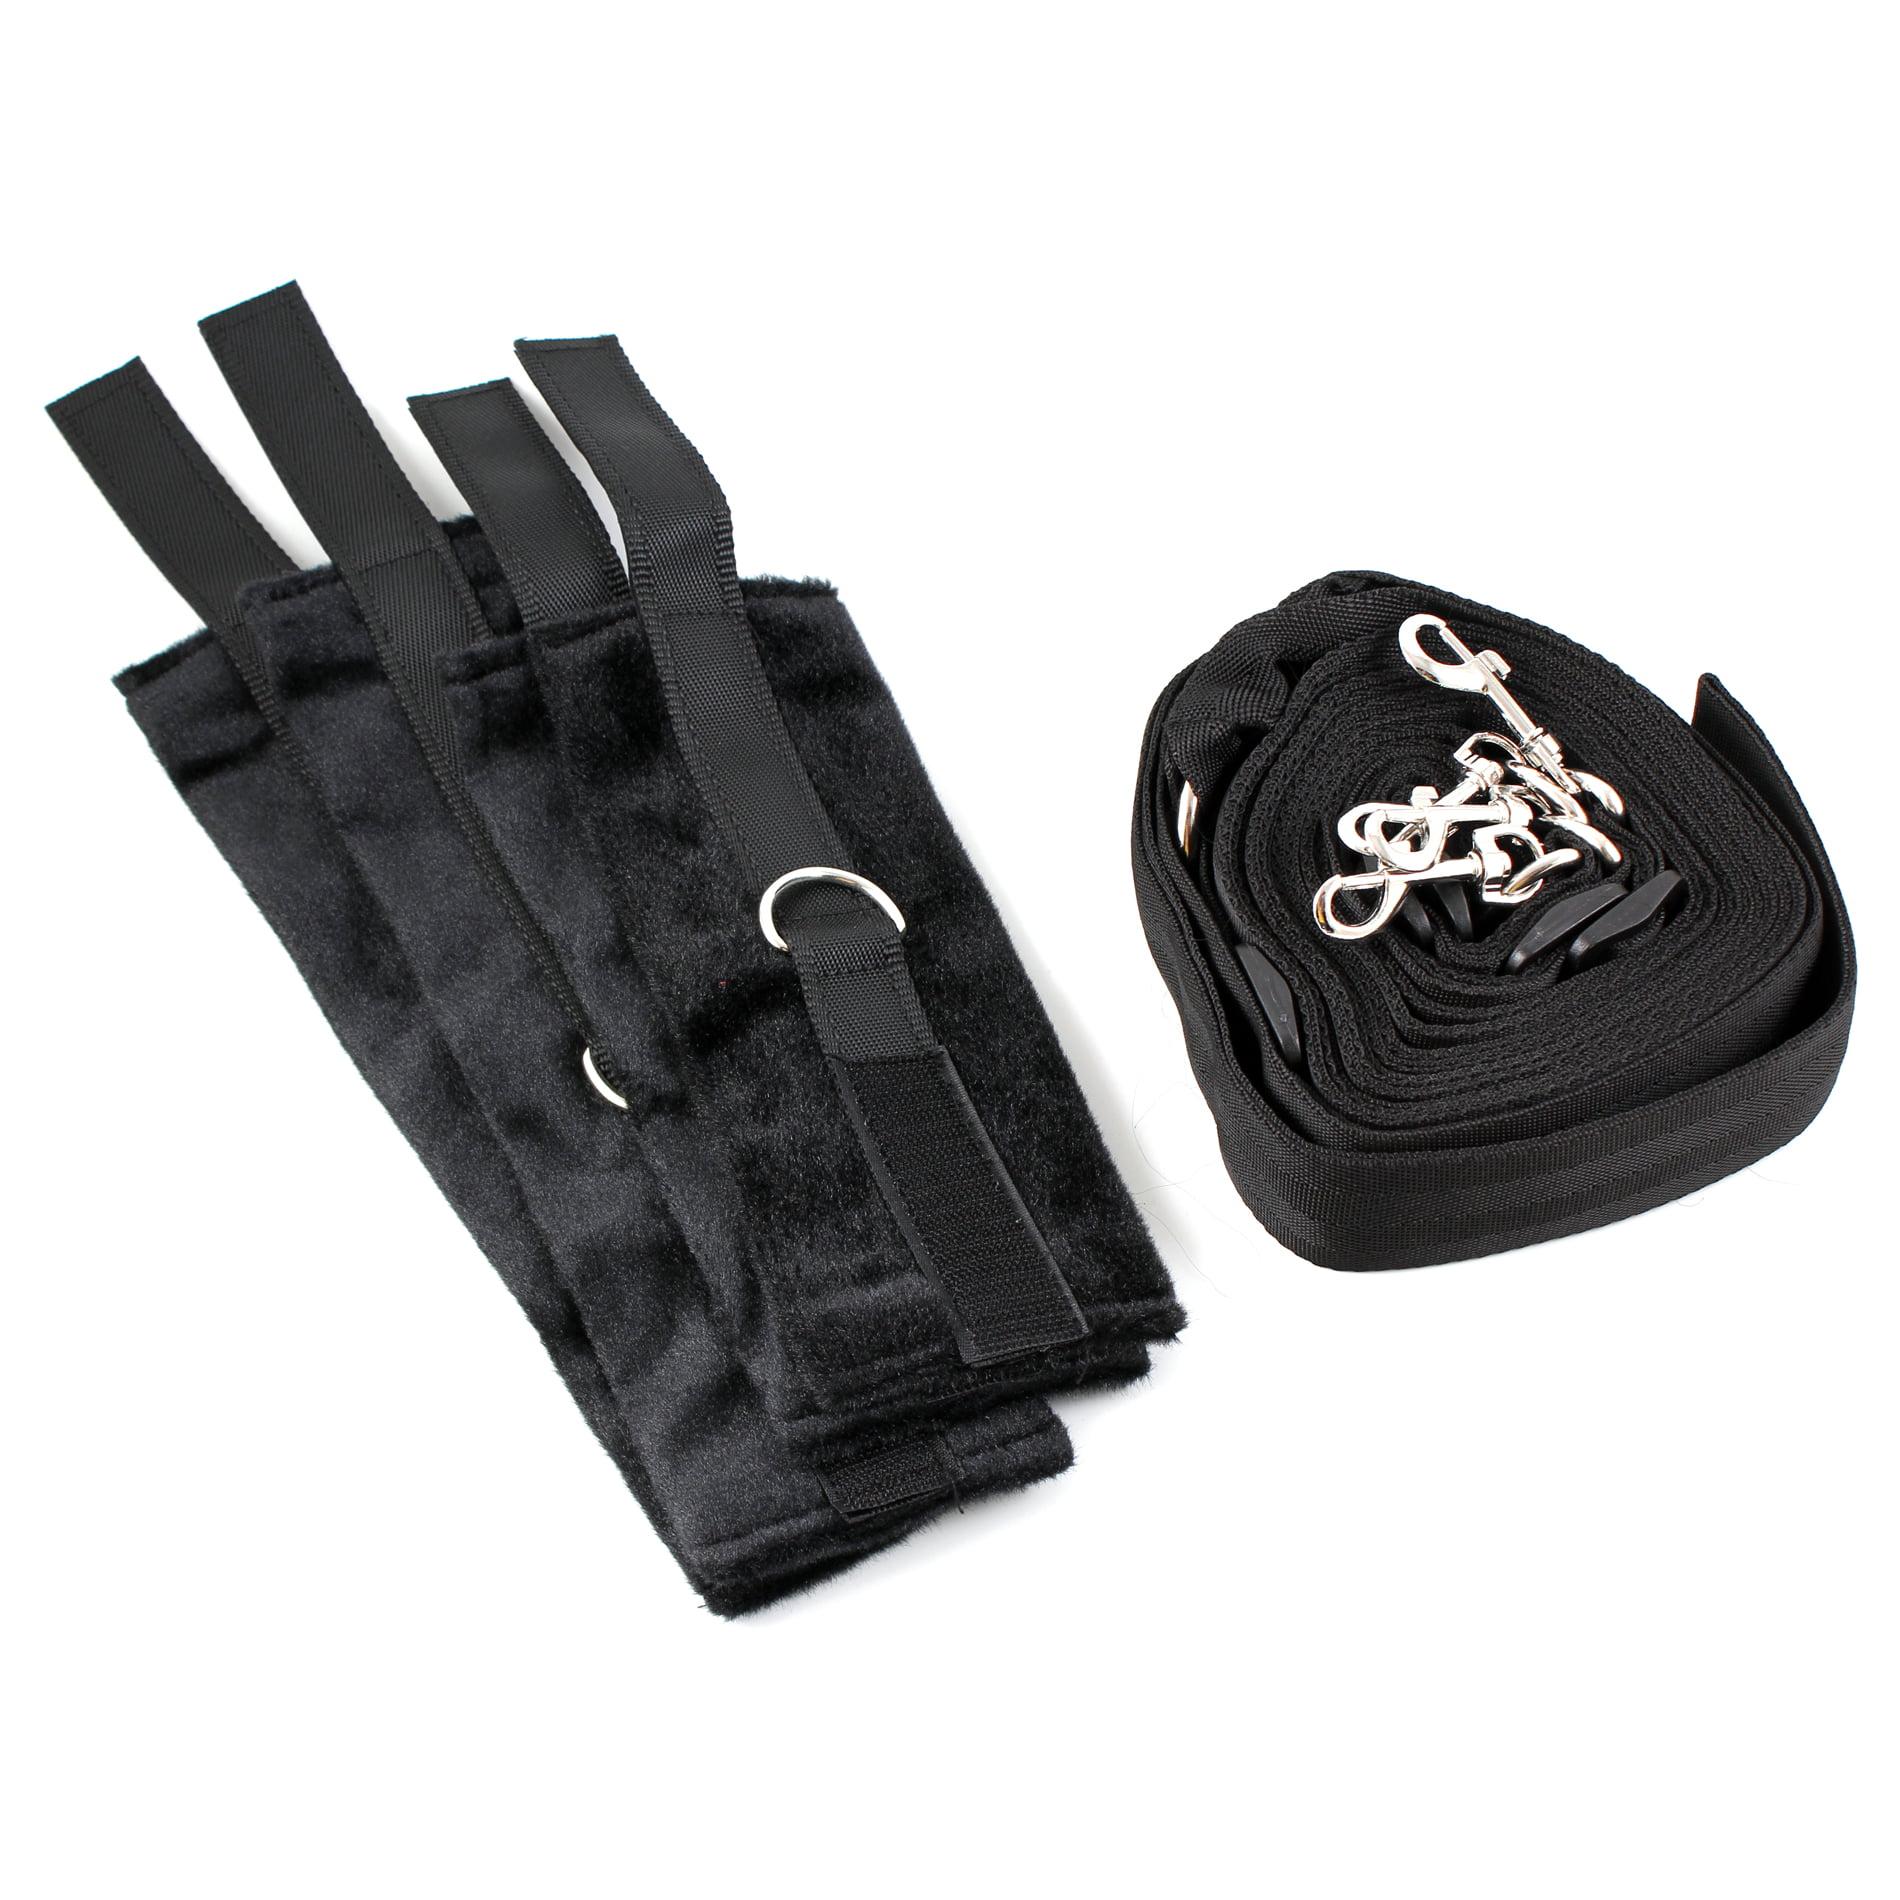 Black Underbed Sex Restraining Set Straps SM Handcuffs Leg Cuffs for Couples